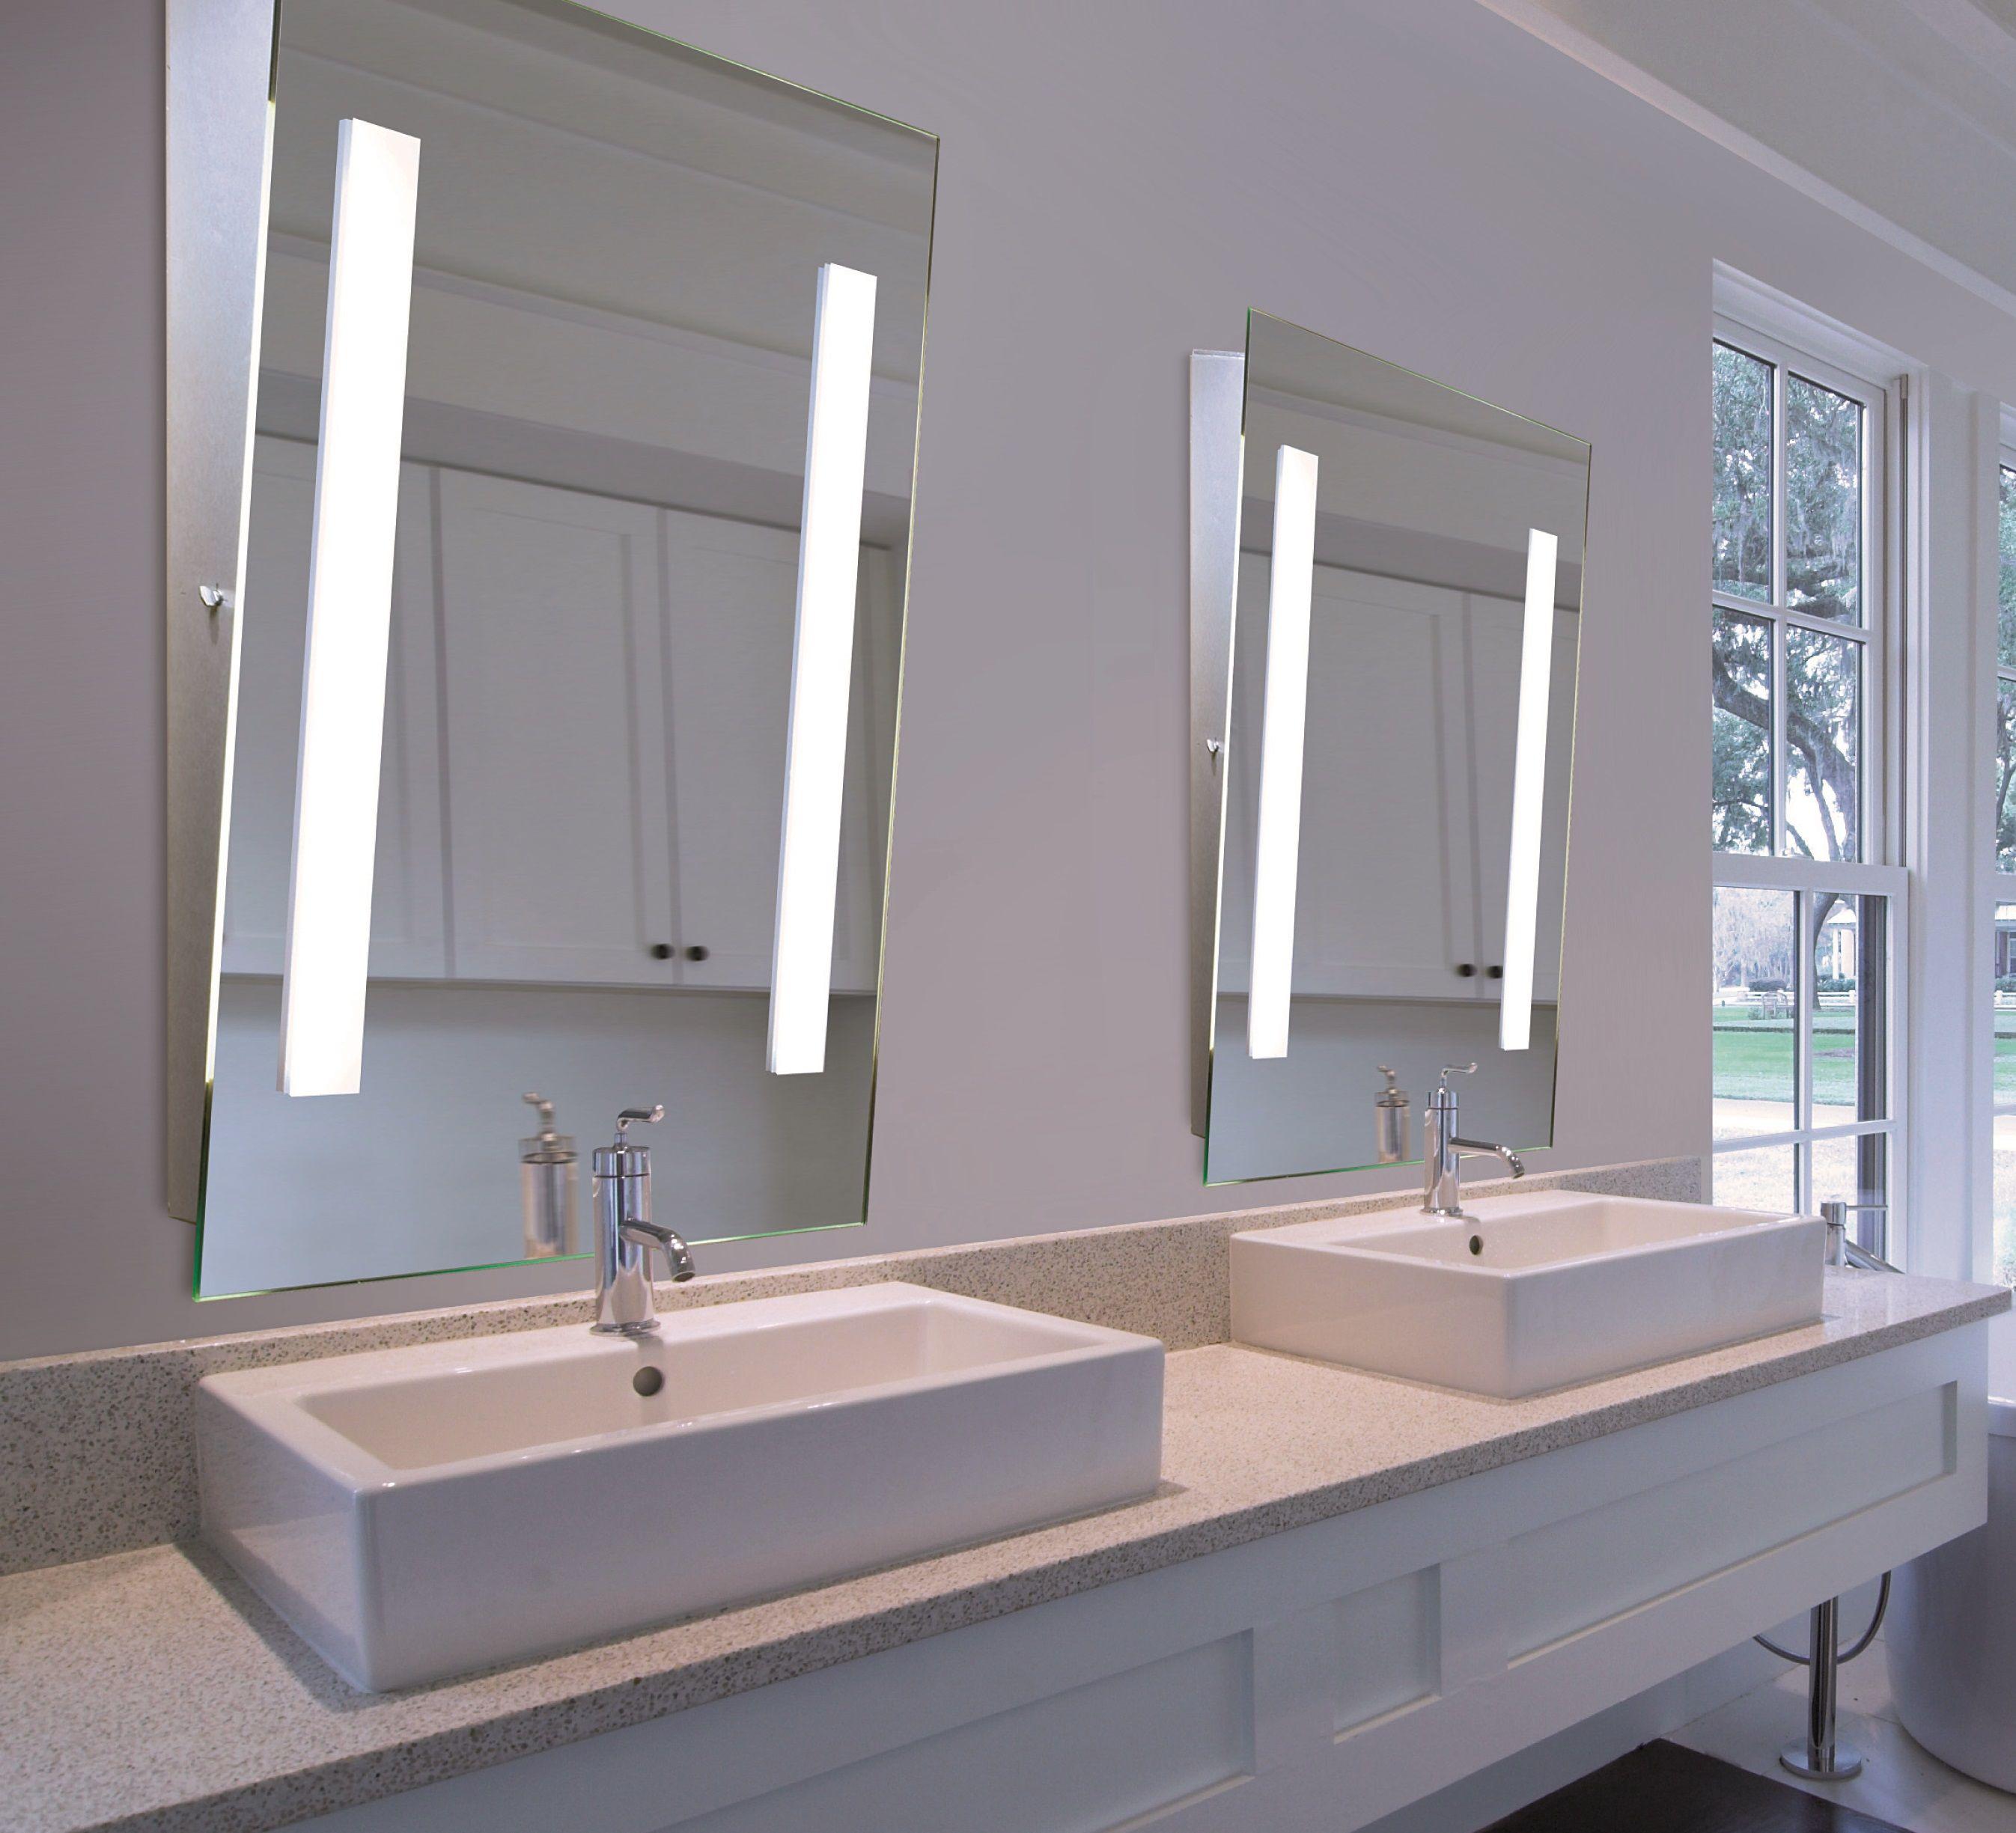 Lighted tilted mirrors | Bathroom decor, Mirror, Small ...